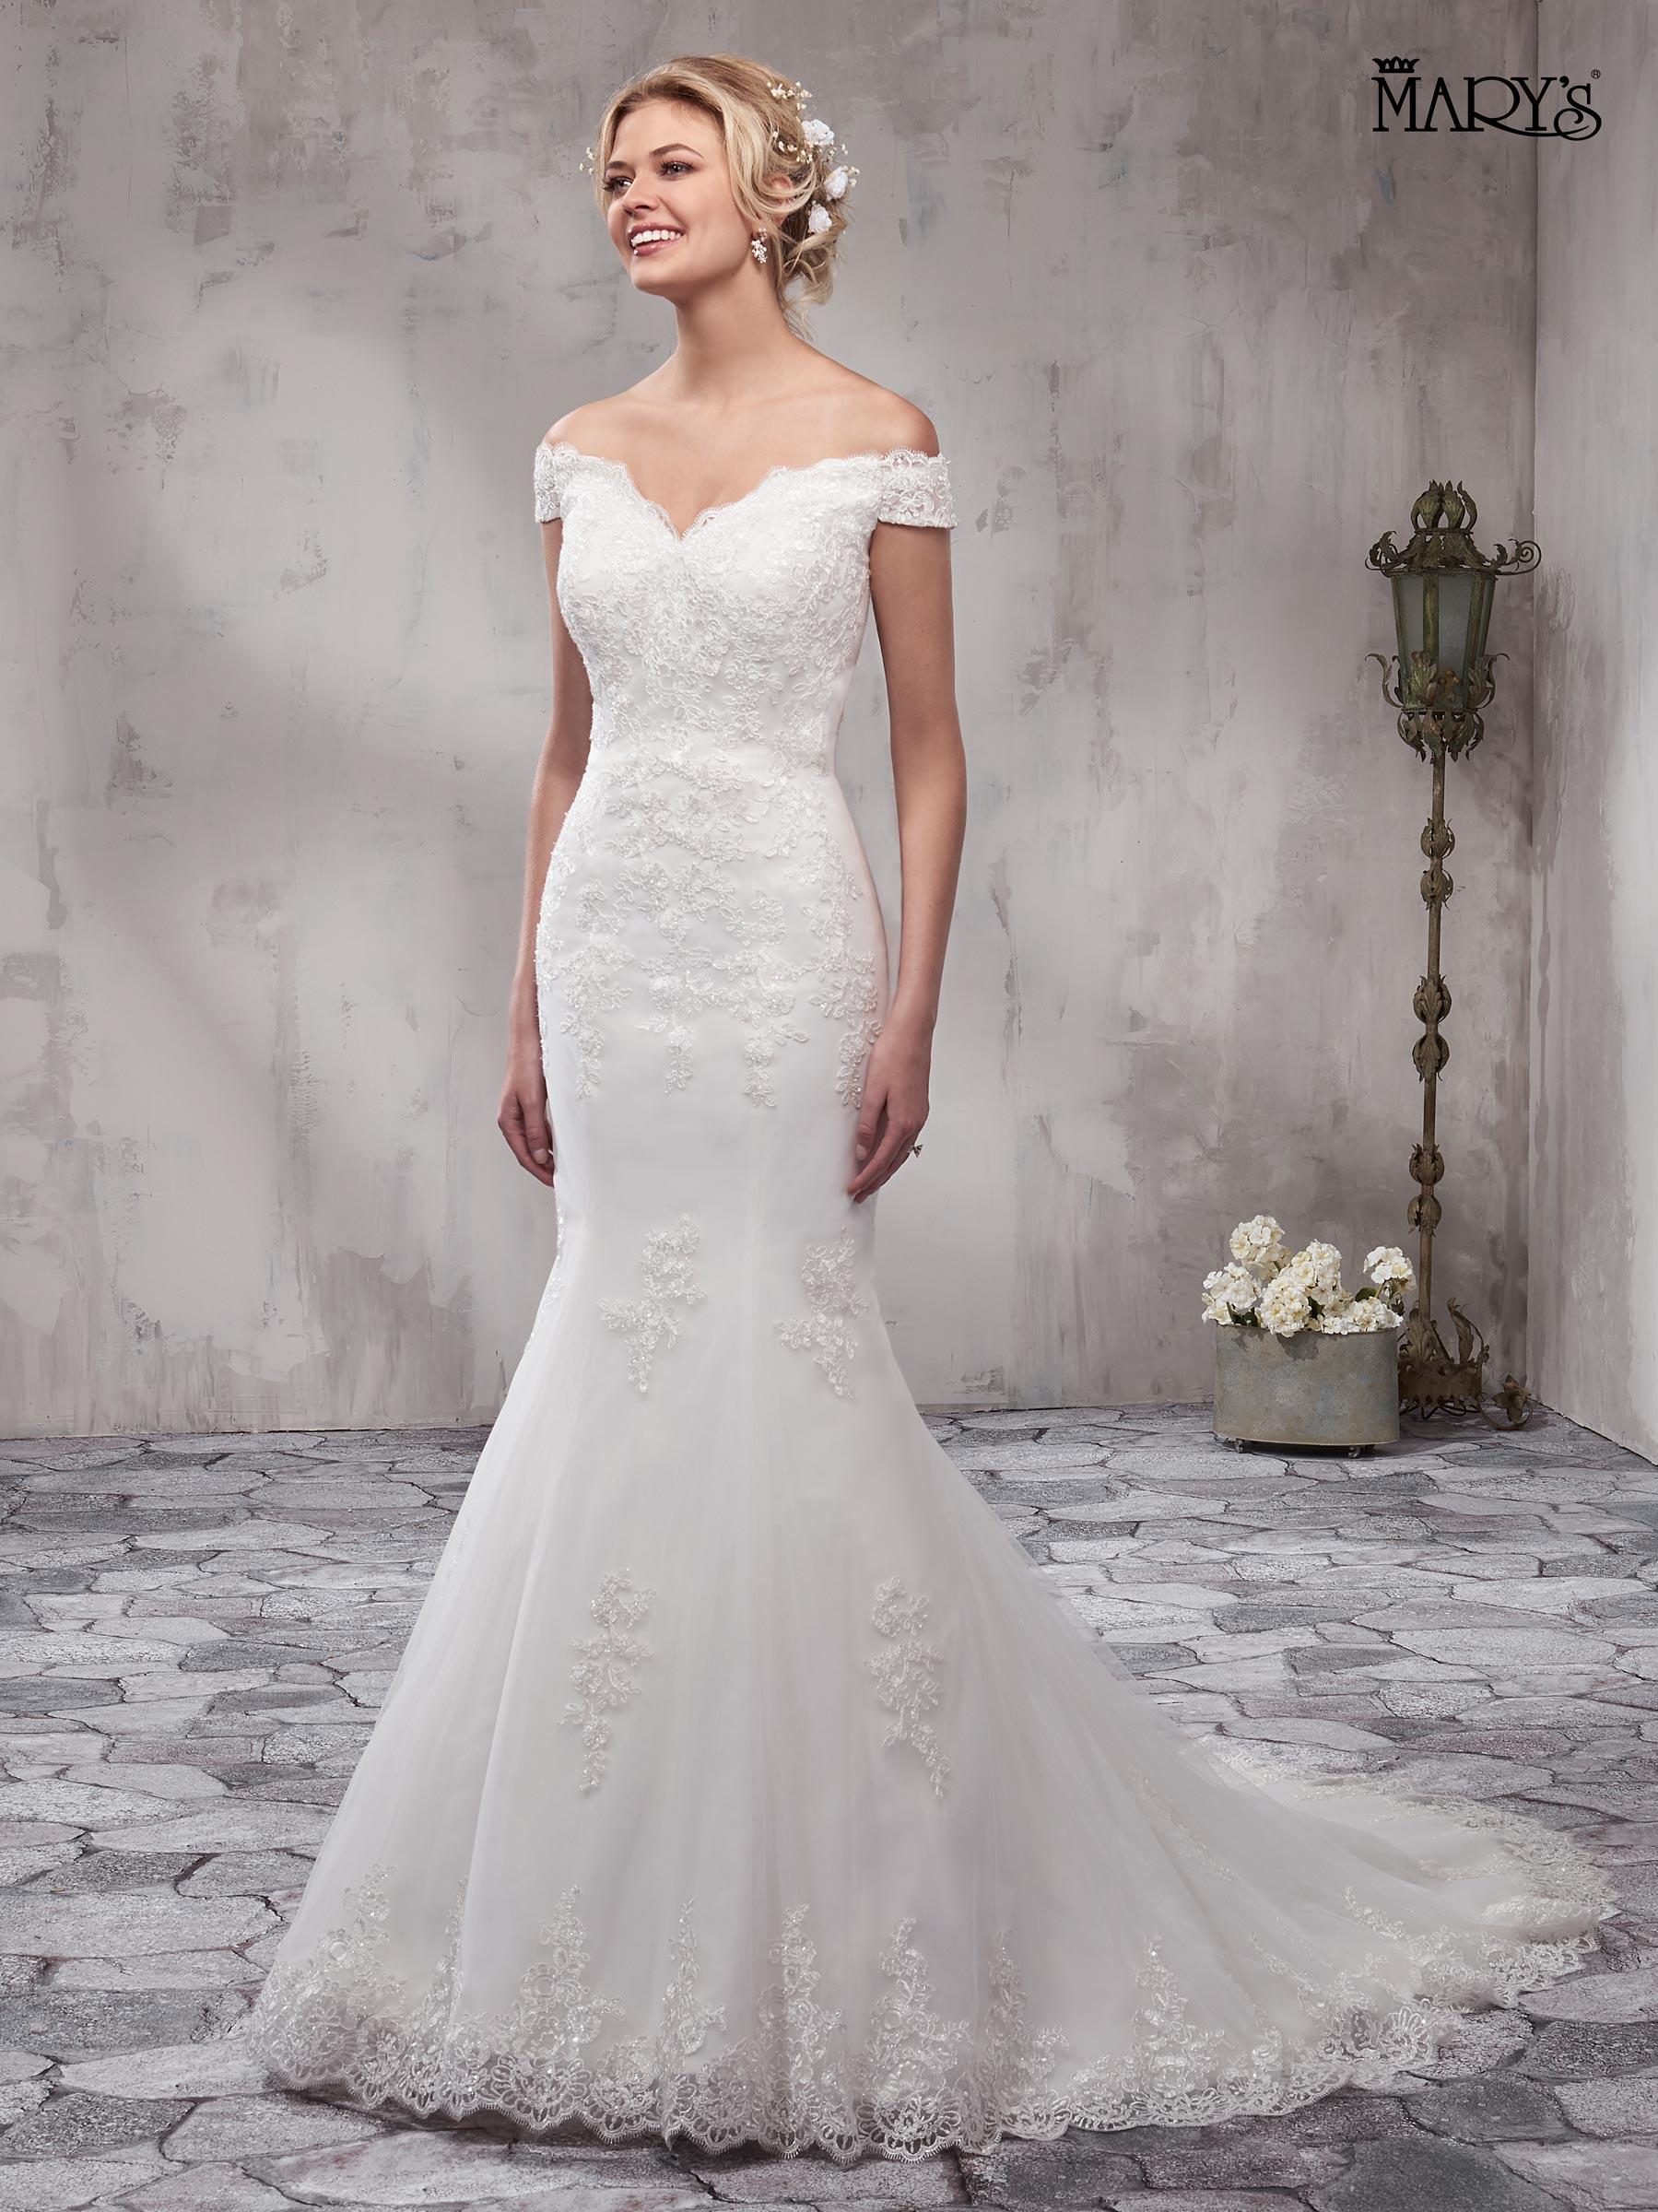 Bridal Wedding Dresses | Mary's | Style - MB3003